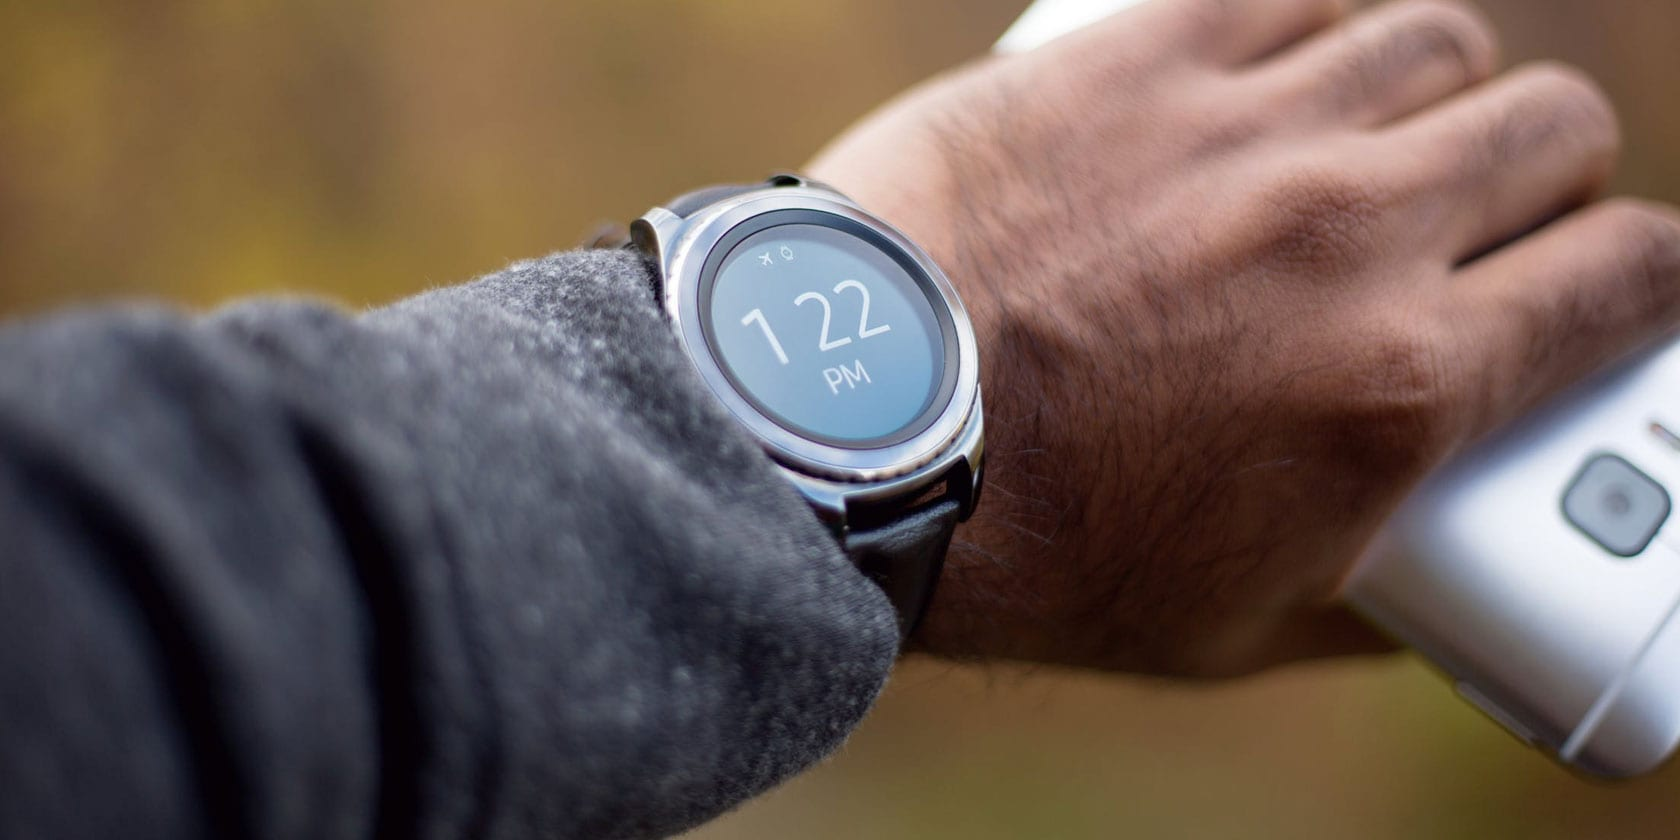 samsung-galaxy-smartwatch-tips